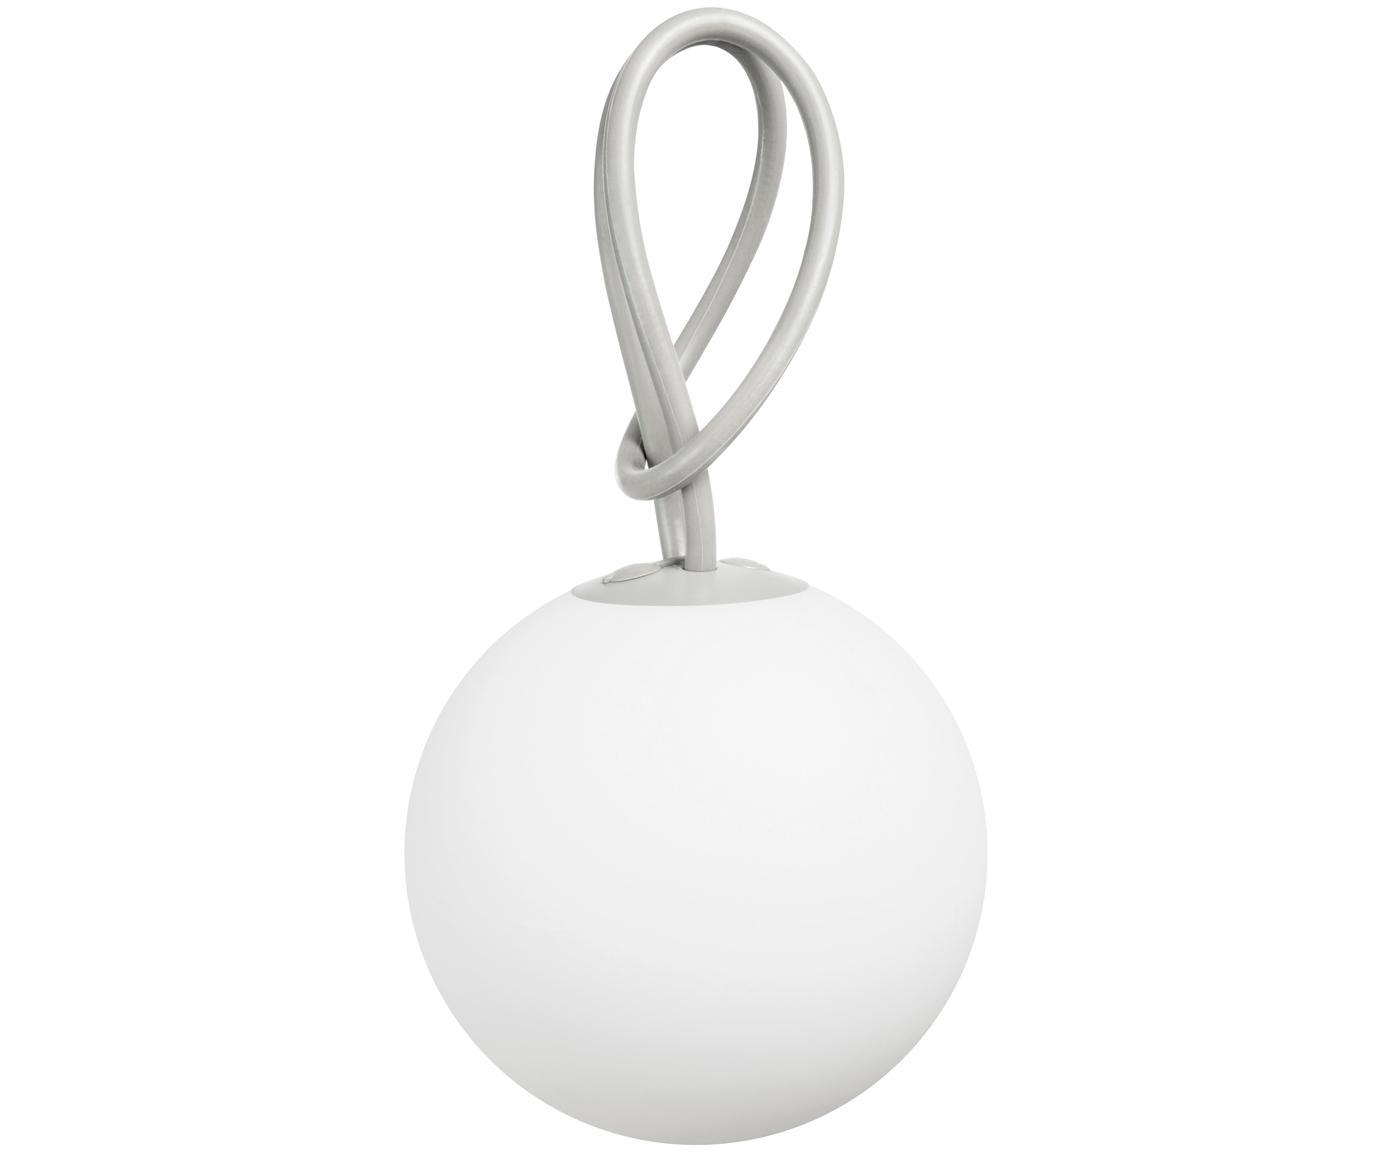 Mobile LED Außenleuchte Bolleke, Weiß, Hellgrau, Ø 20 x H 20 cm